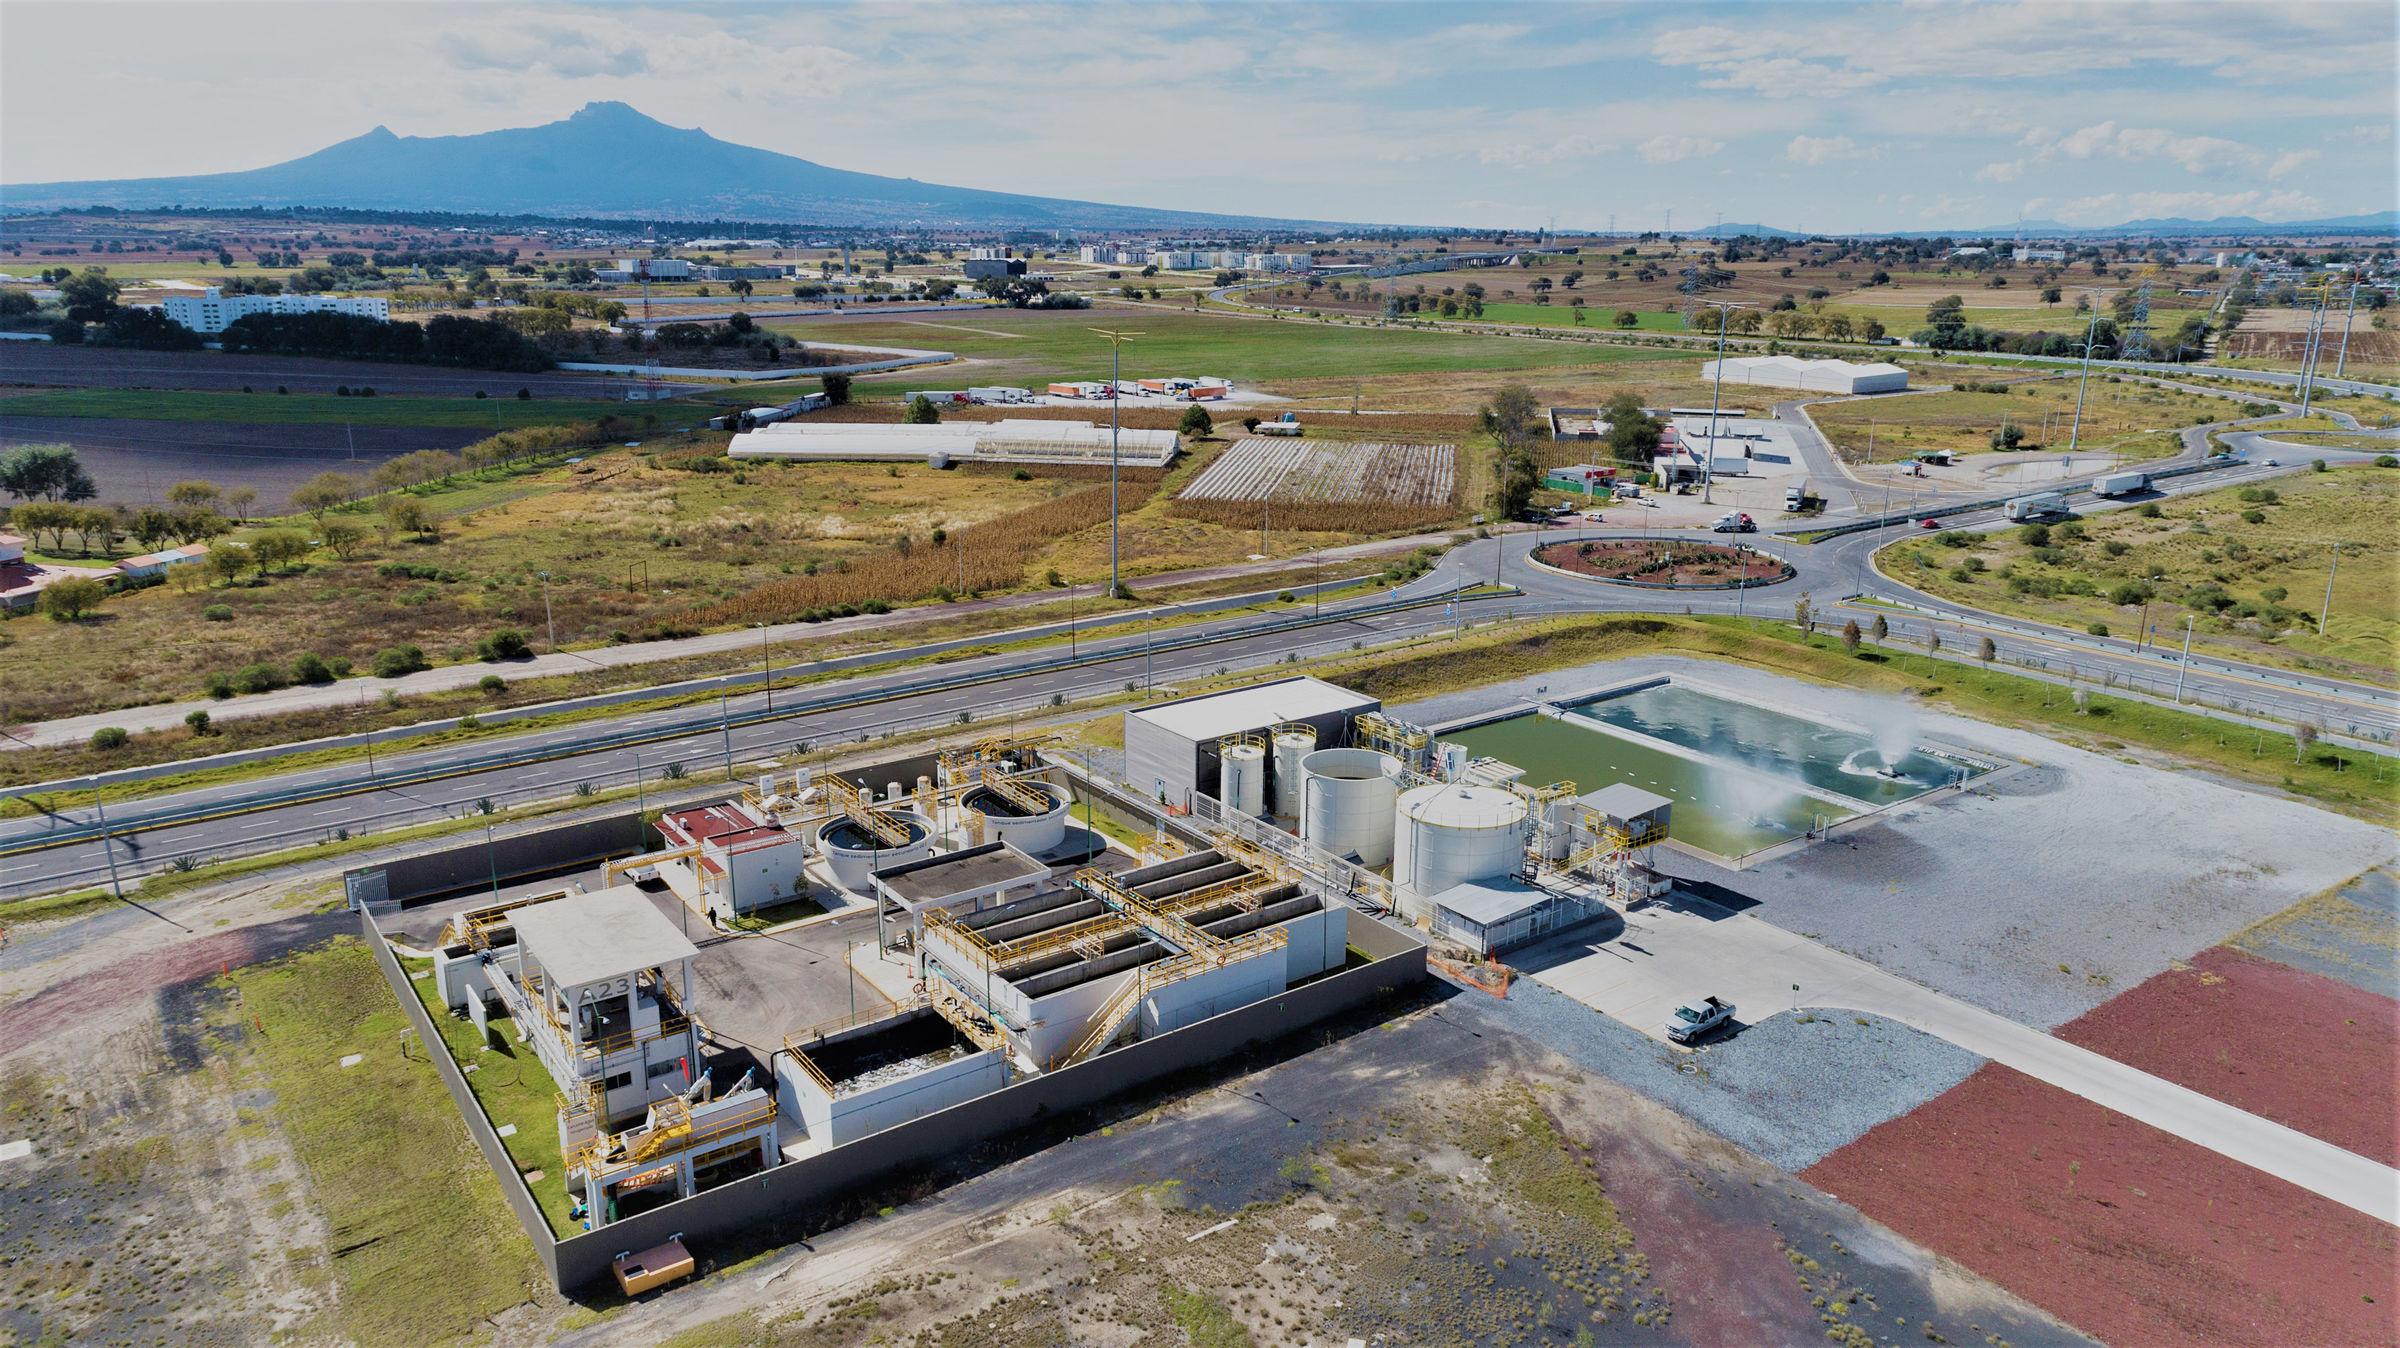 Audi México cleans 100 million liters of water